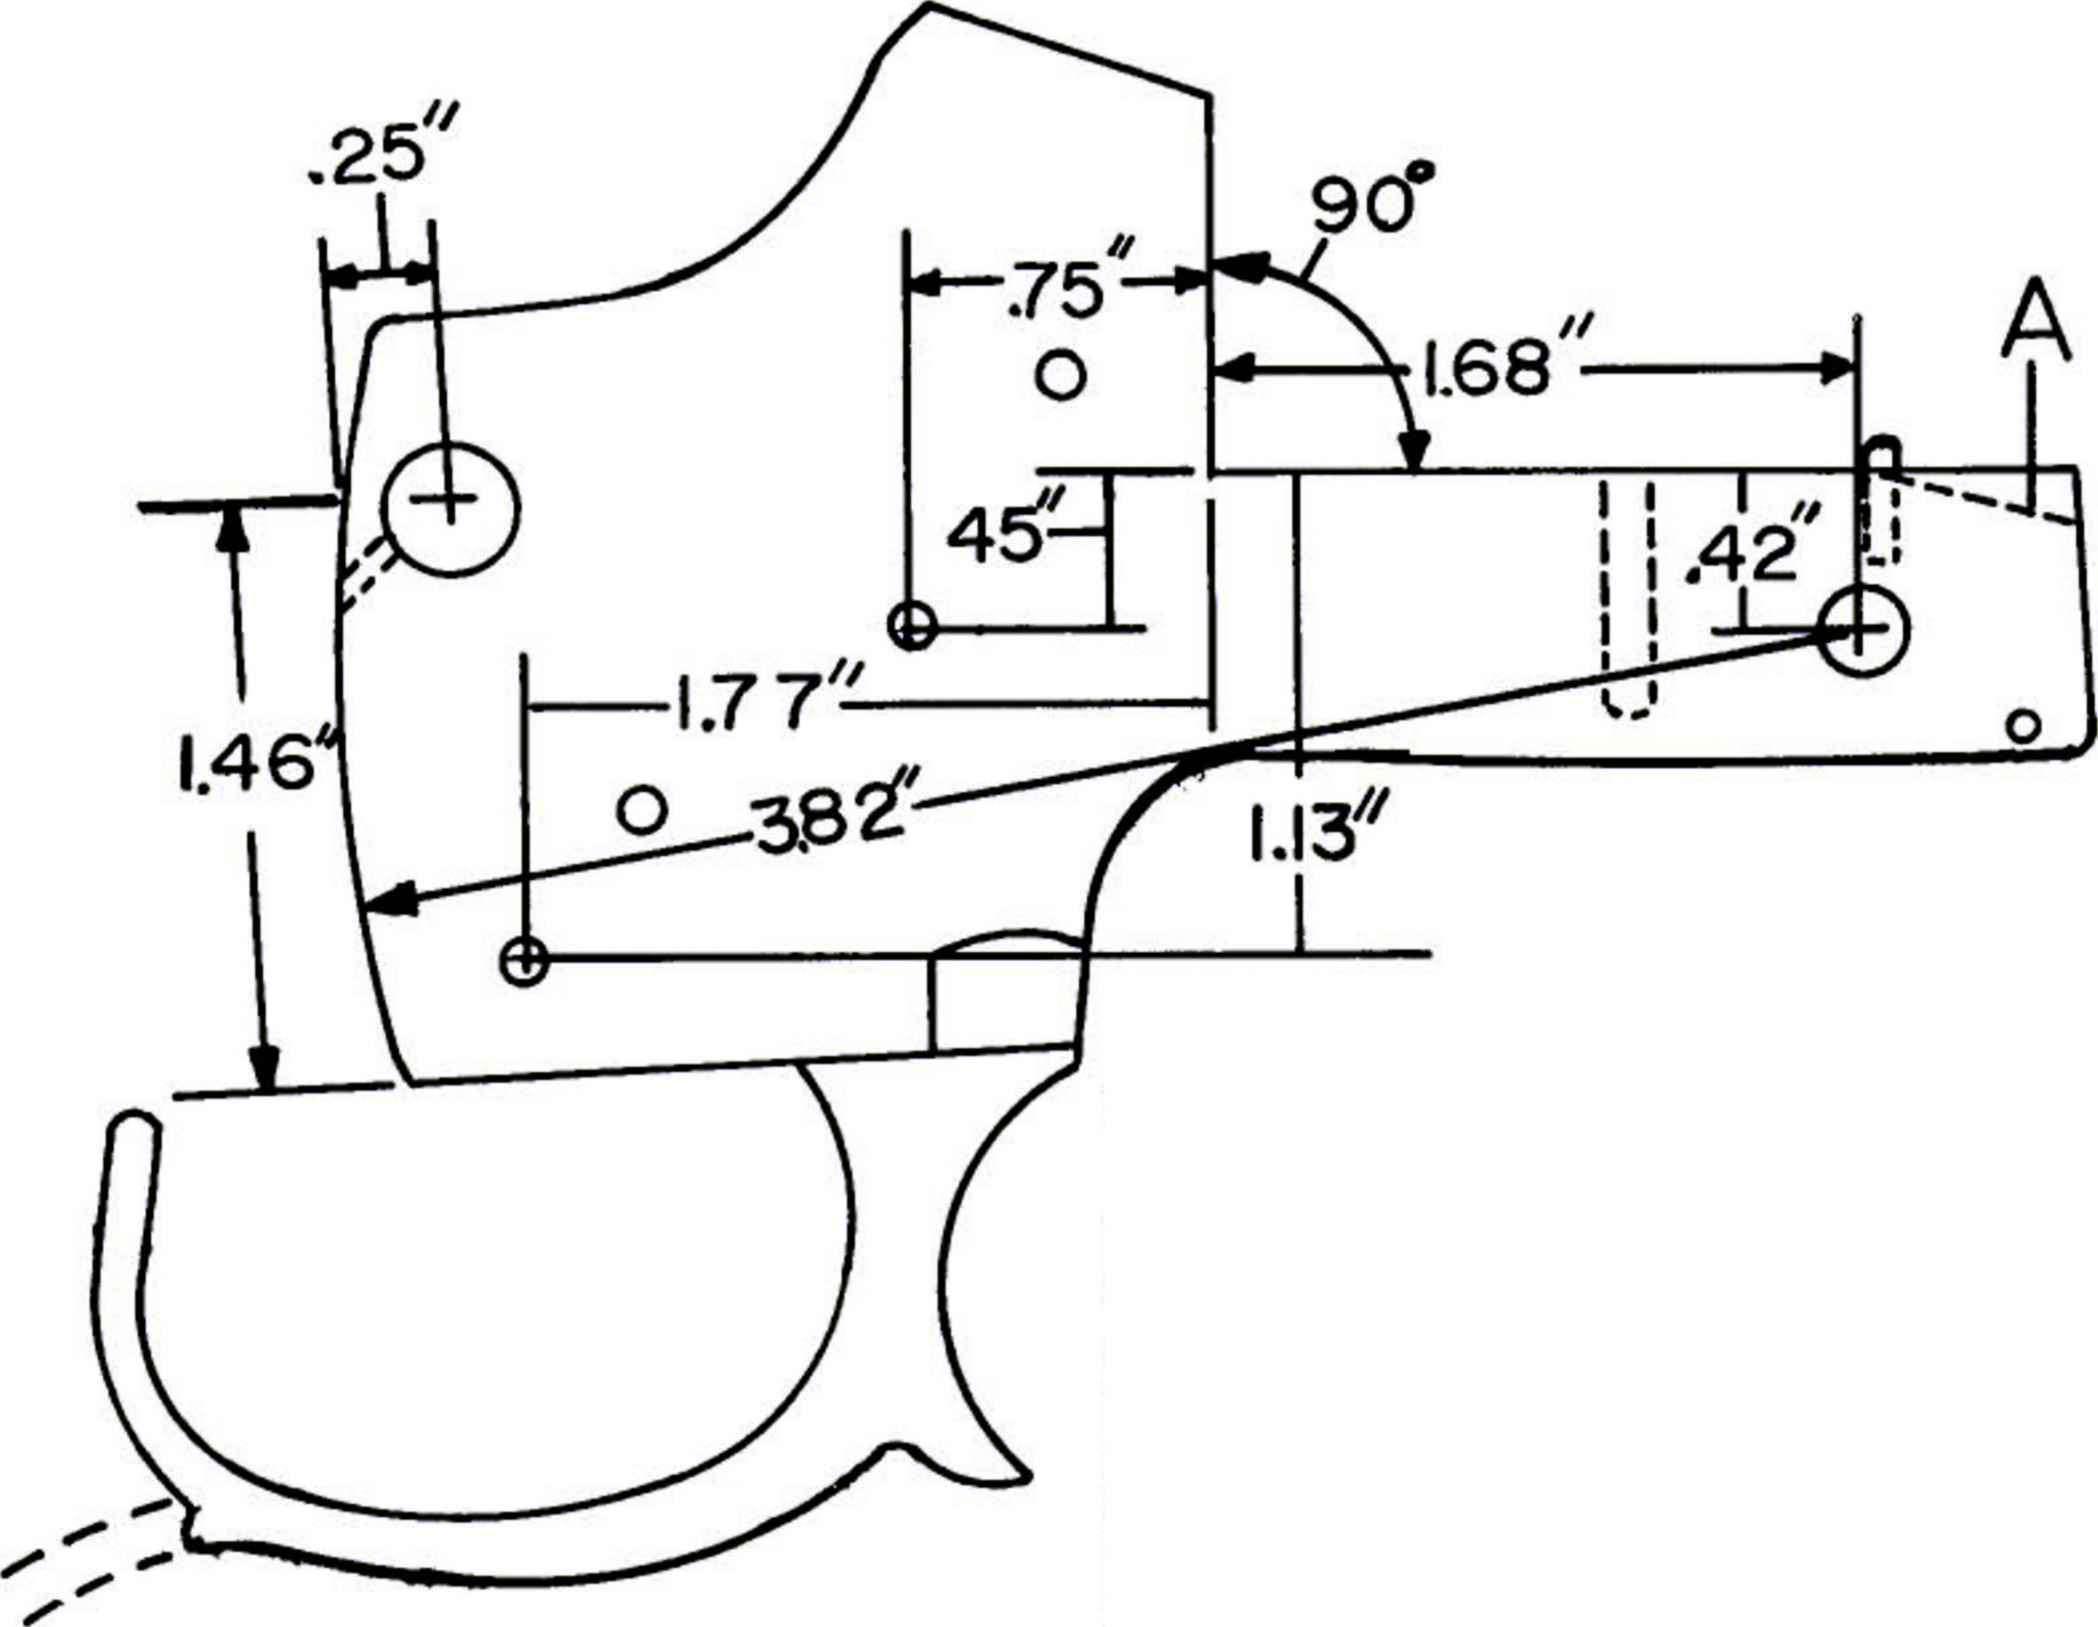 Chicopee Rifle Plans